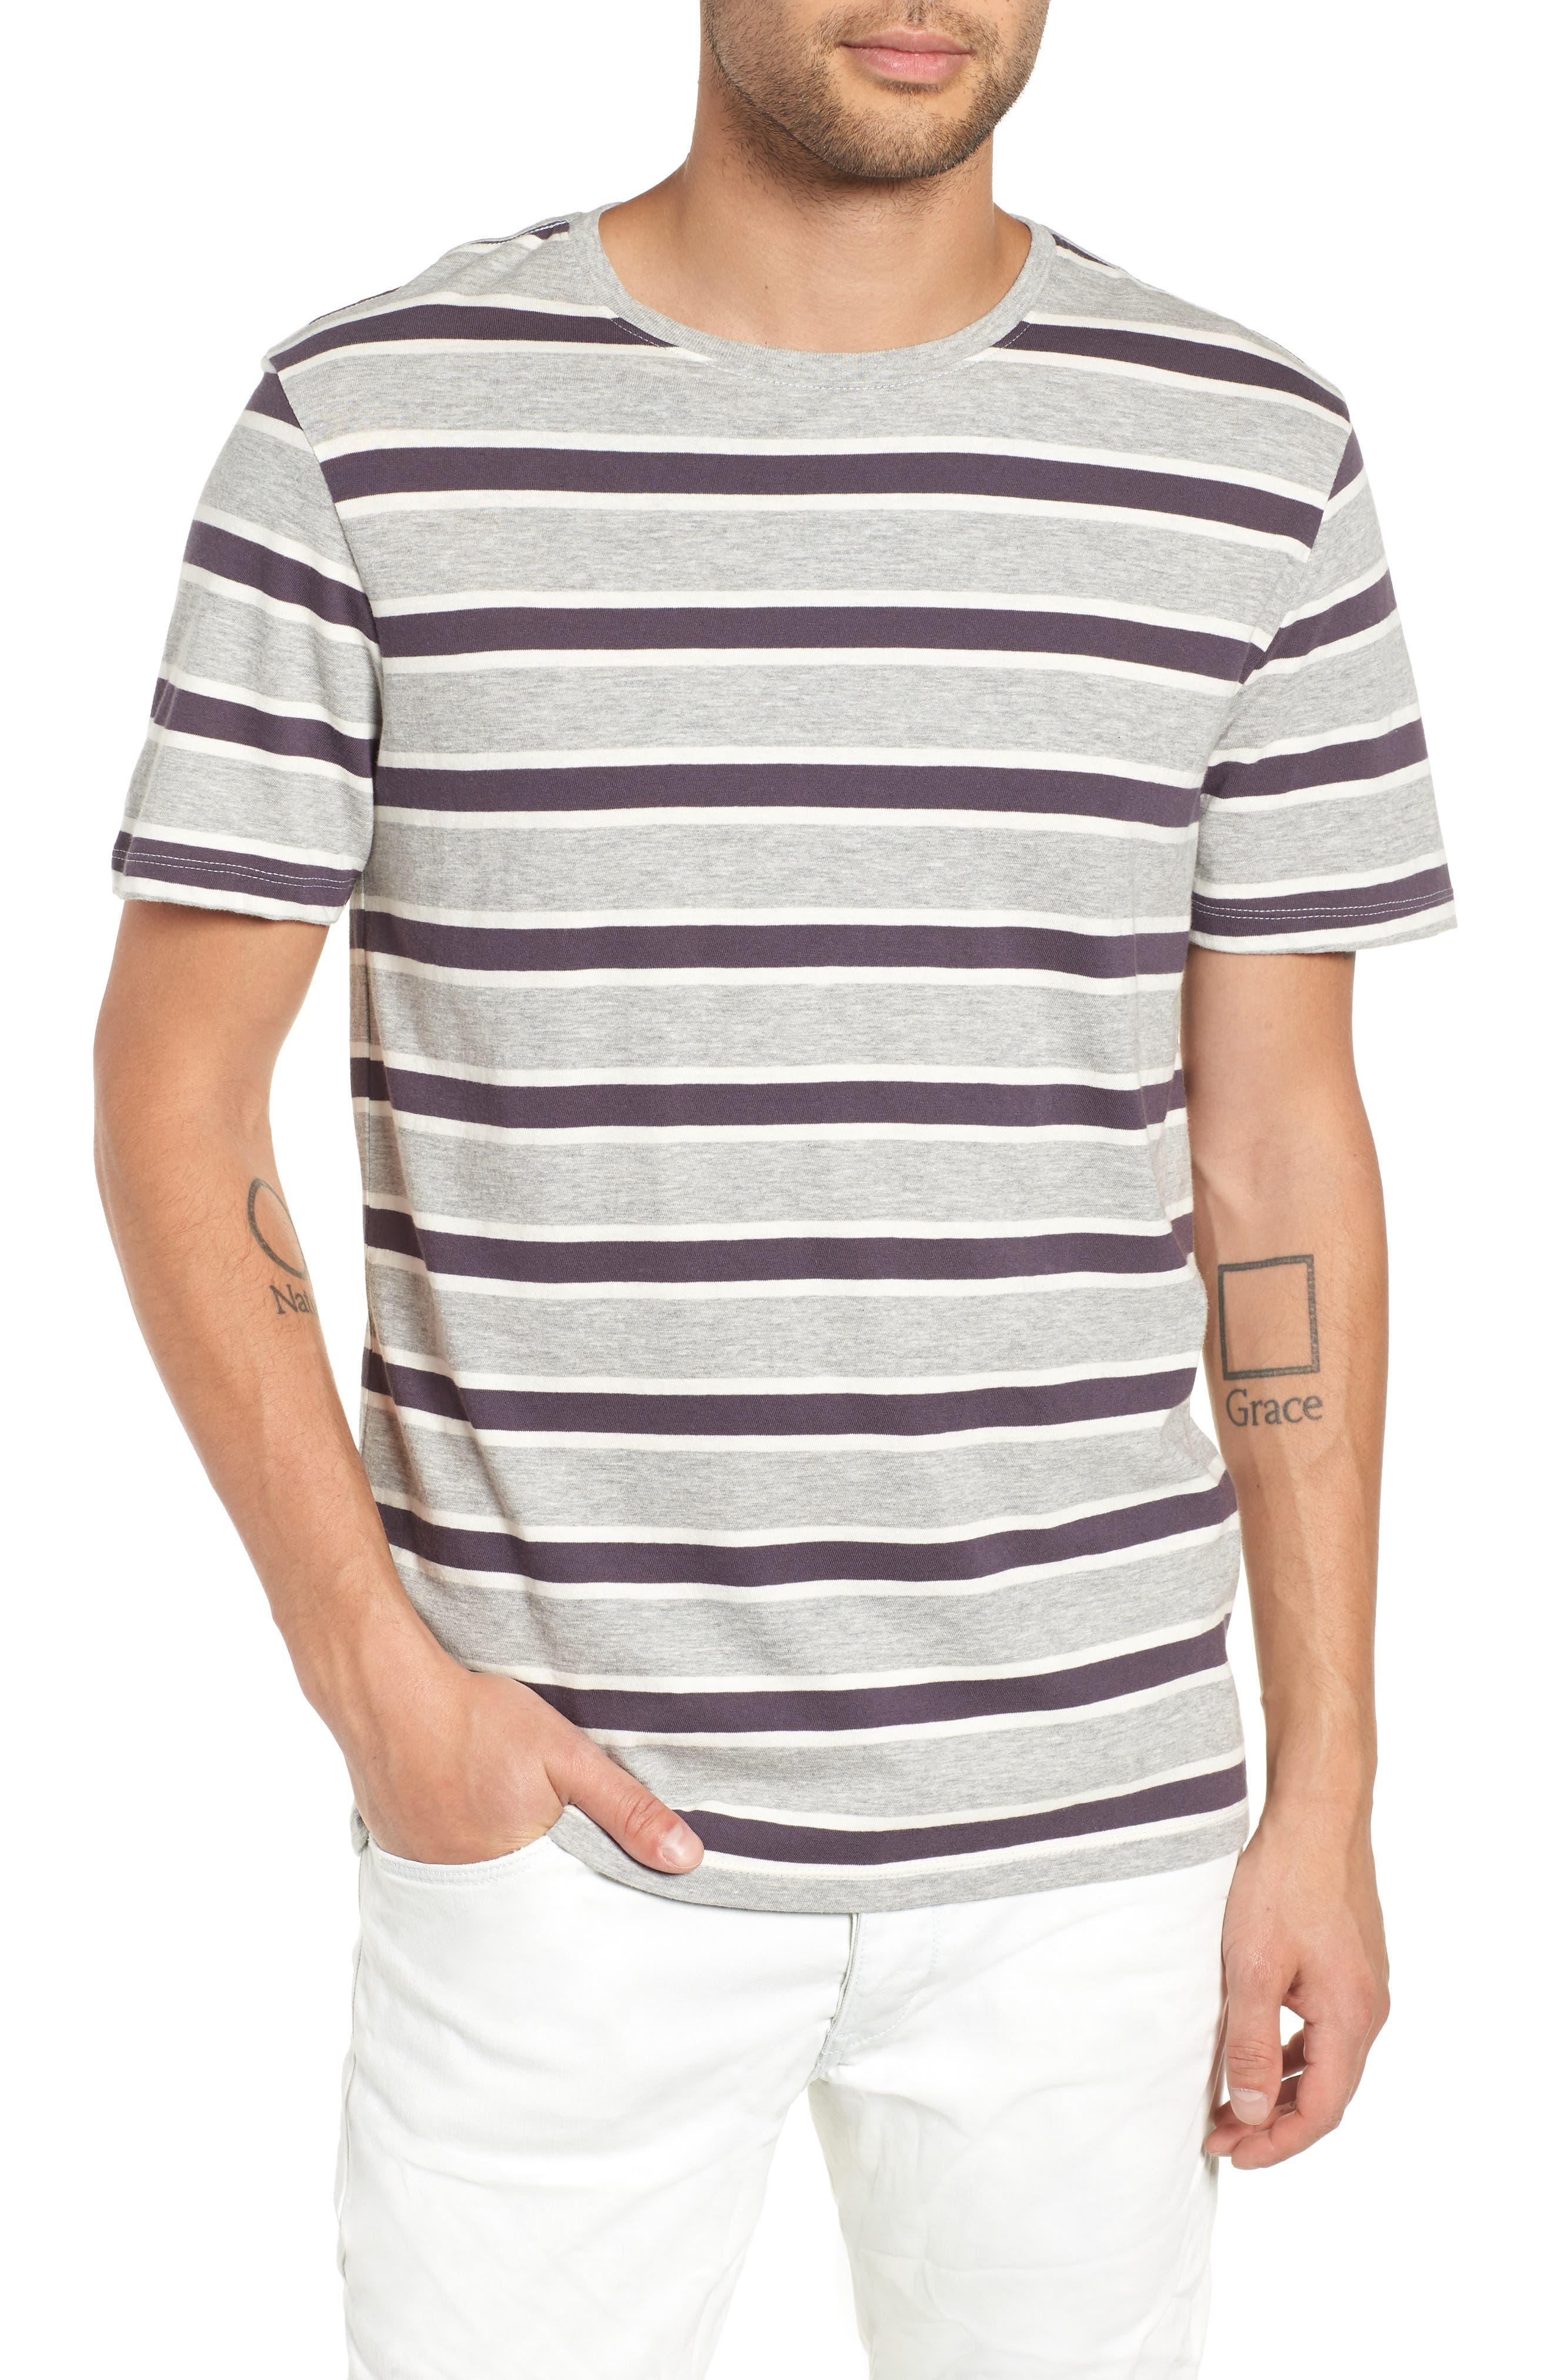 Stripe T-Shirt,                             Main thumbnail 1, color,                             GREY ASH HEATHER- WHITE STRIPE